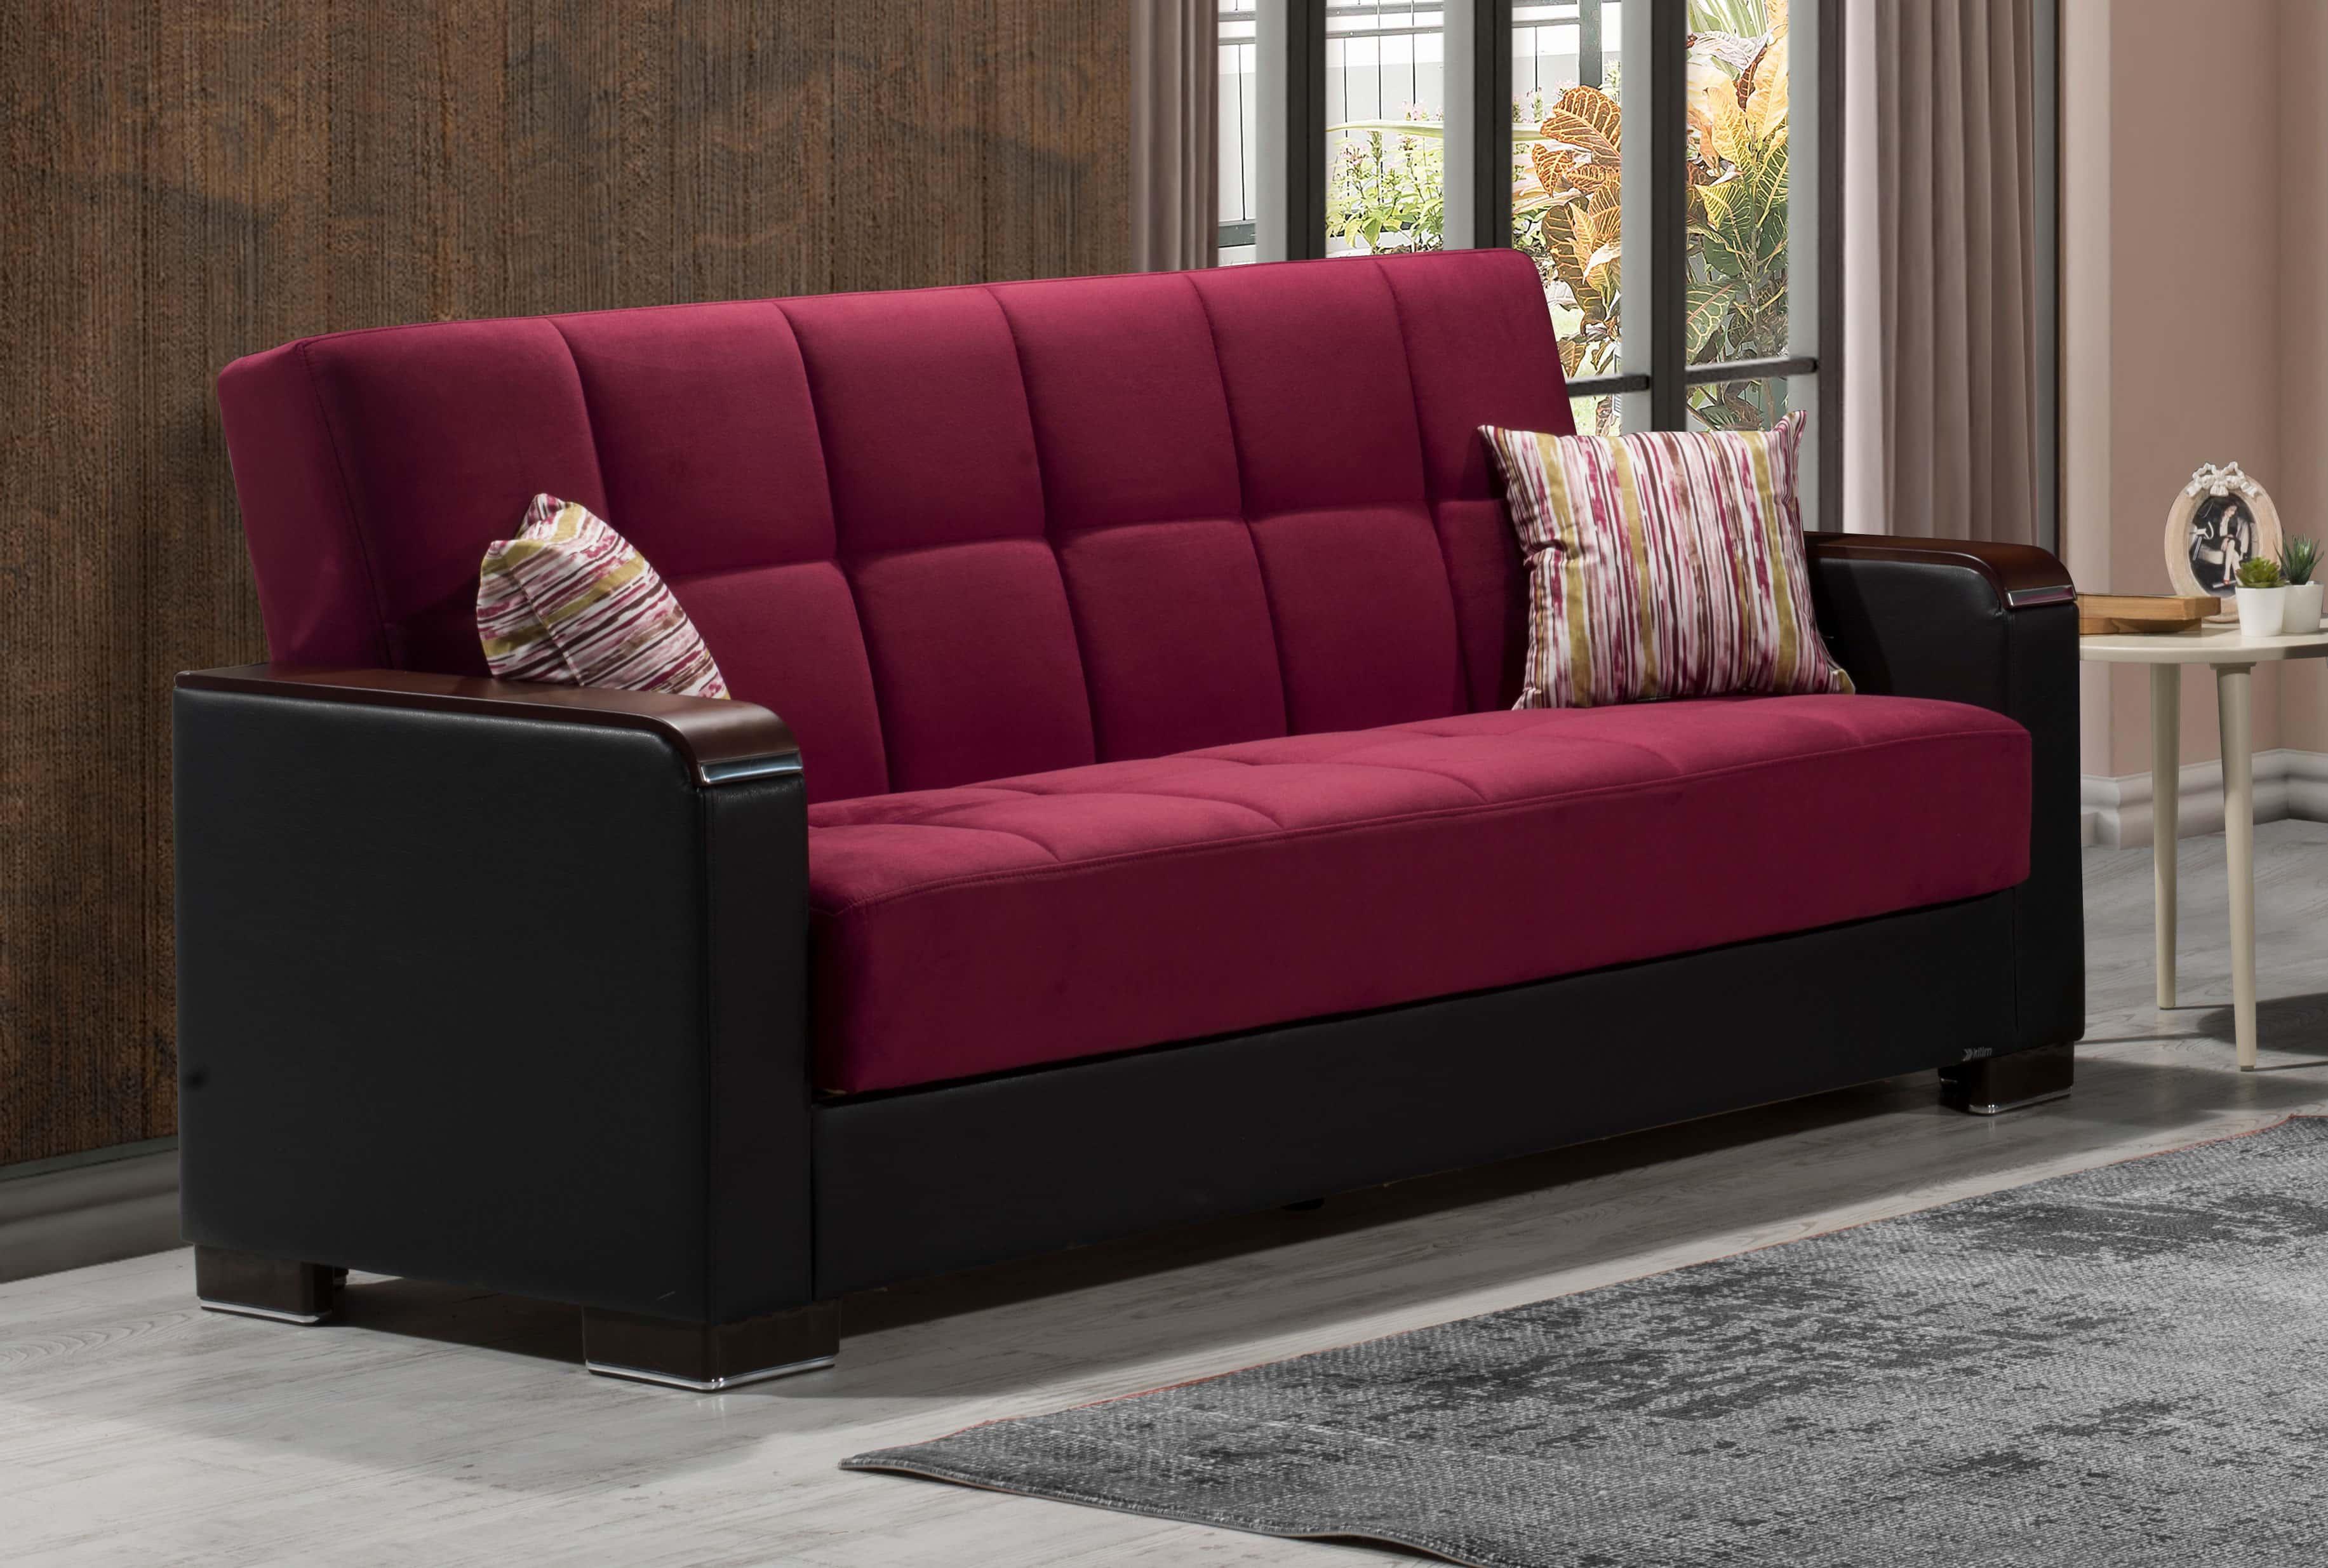 Fantastic Armada X Burgundy Sofa Bed By Casamode Ibusinesslaw Wood Chair Design Ideas Ibusinesslaworg